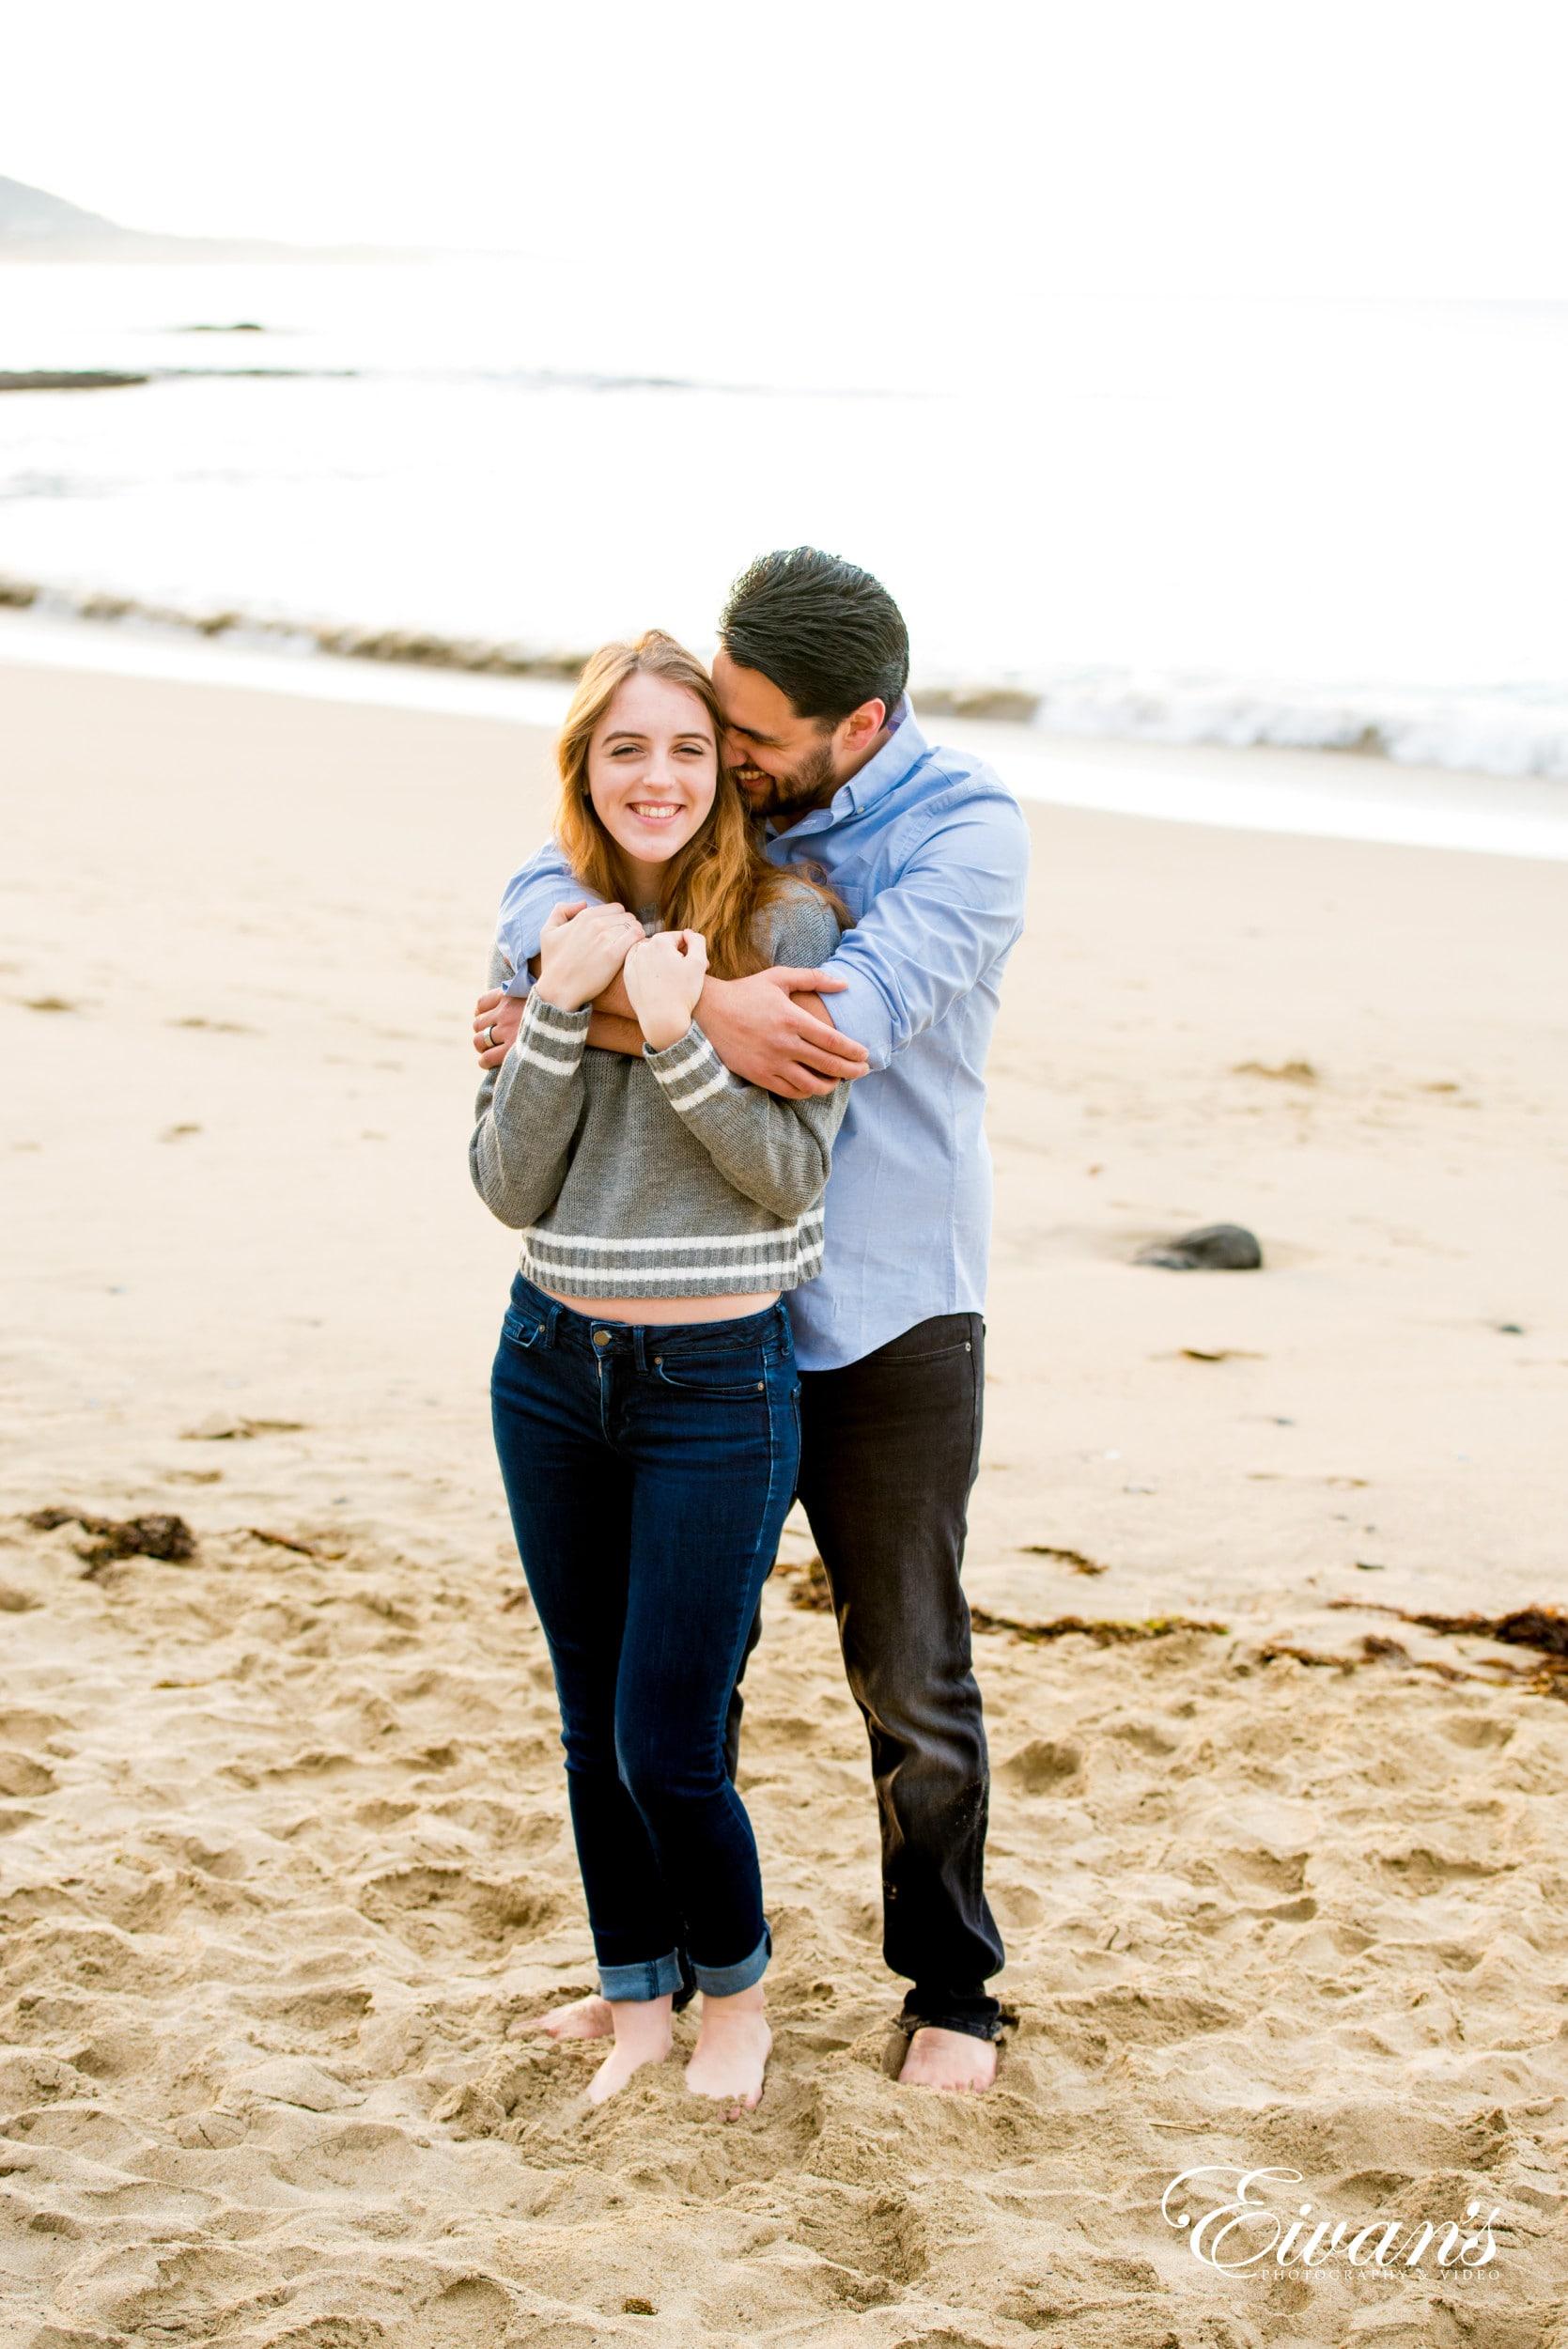 man in gray long sleeve shirt hugging woman in gray long sleeve shirt on beach during